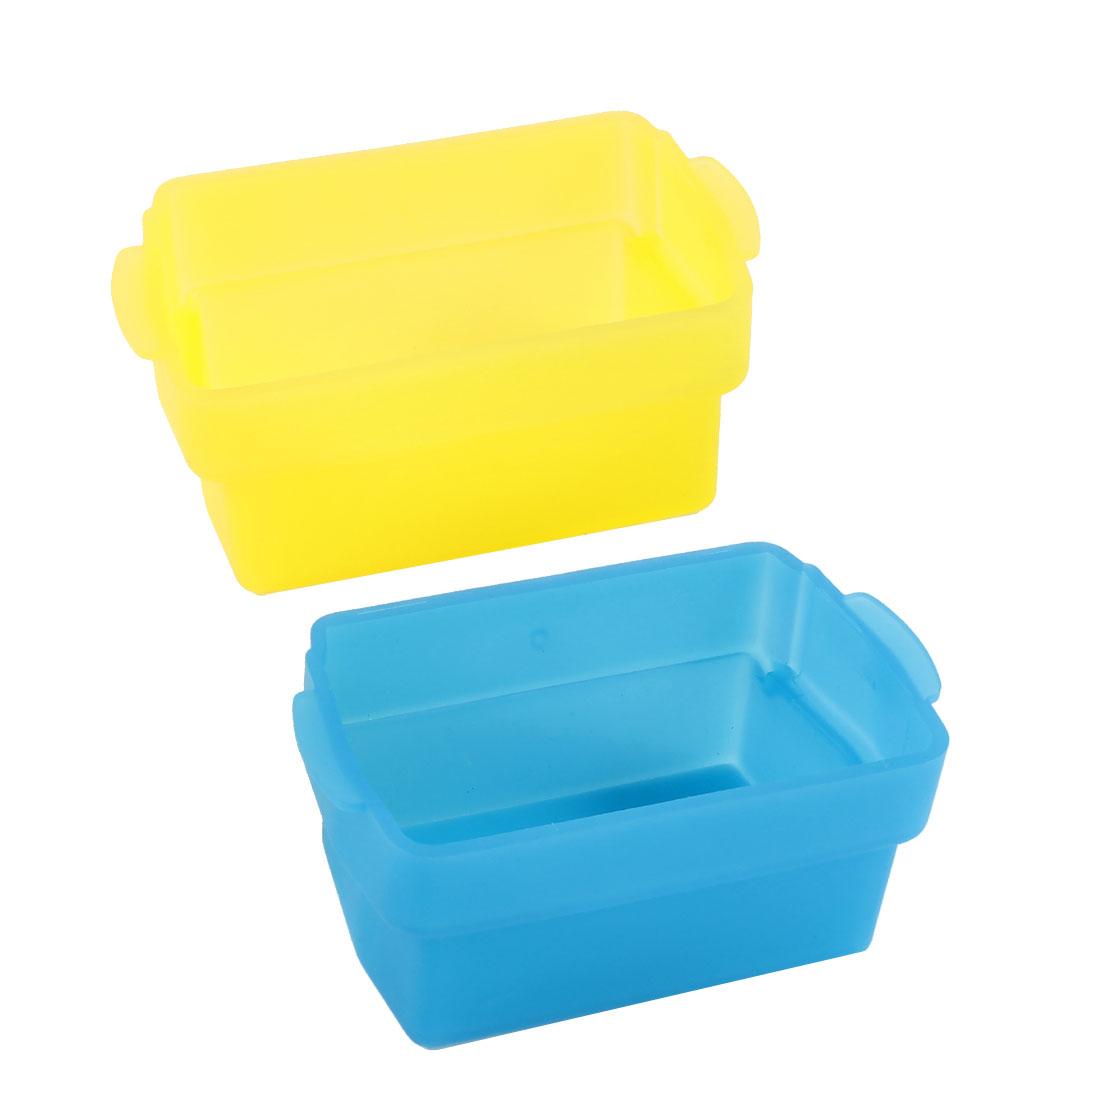 2 Pcs Blue Yellow Digital Camera Bounce Flash Diffuser for Nikon SB600